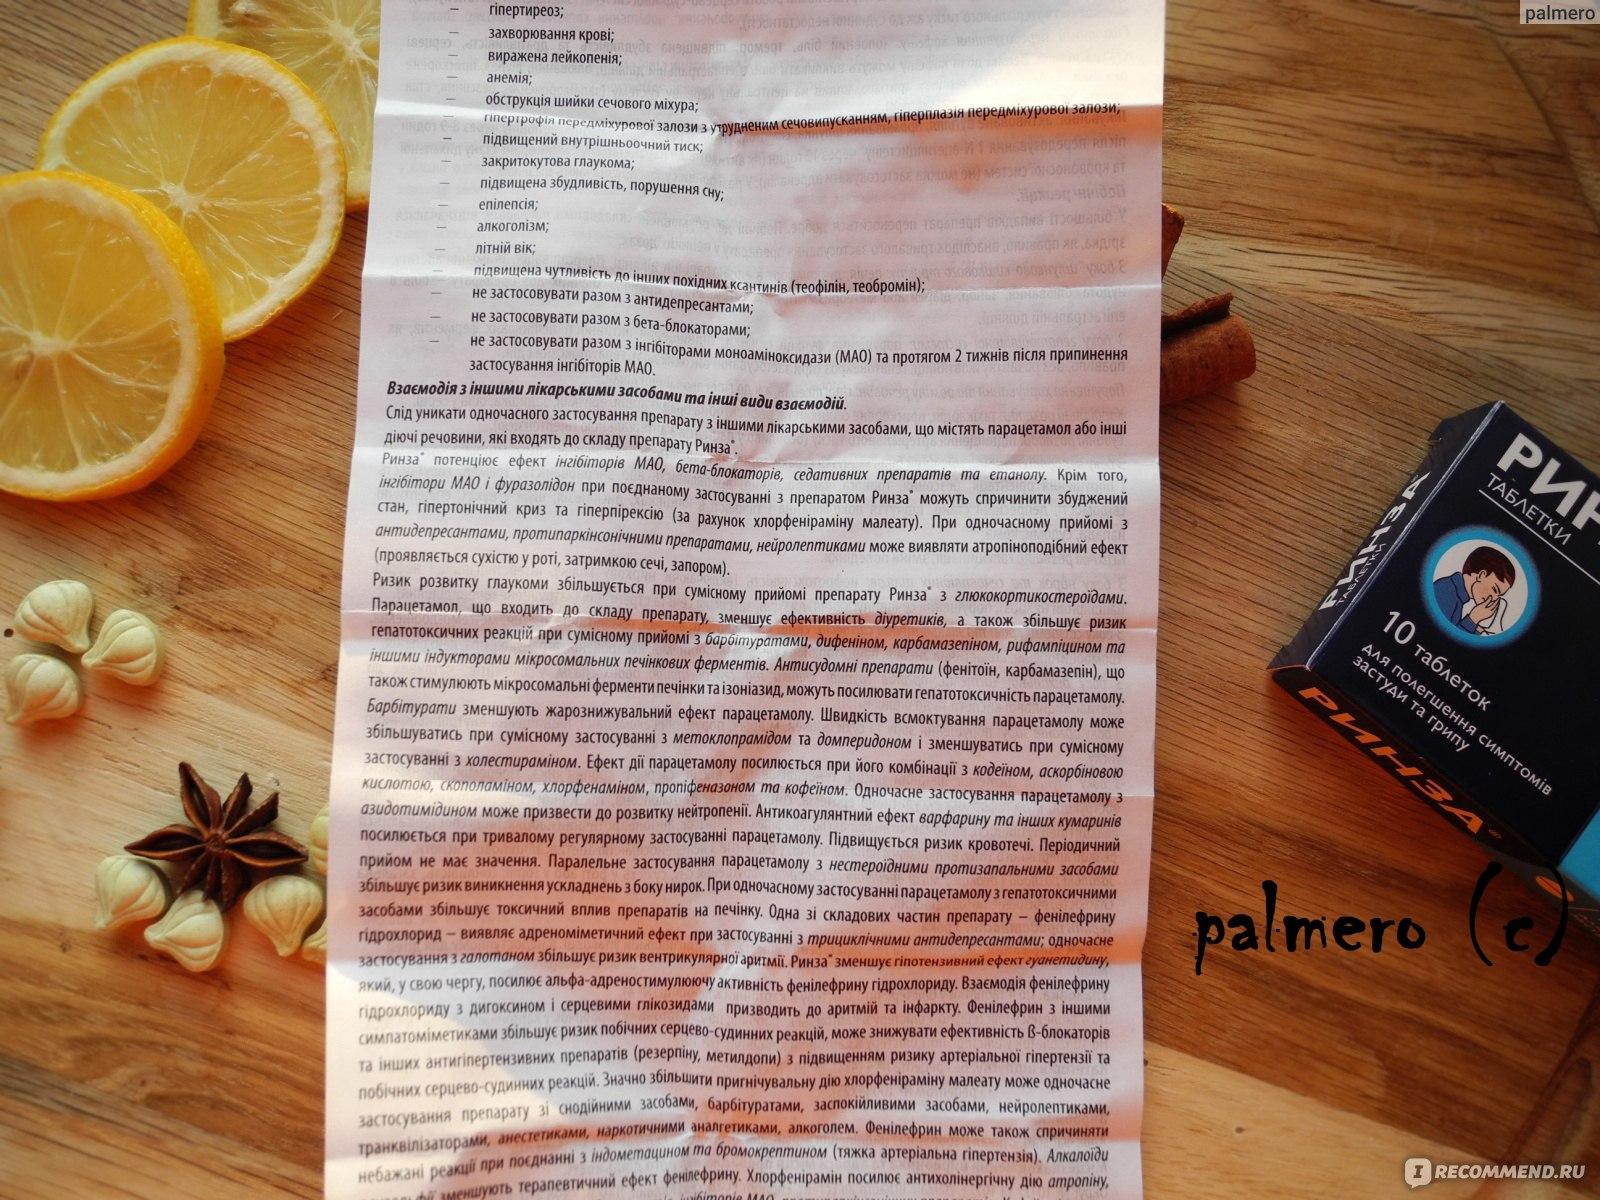 Таблетки РИНЗА® при простуде и гриппе - «Аналог Фервекса ...